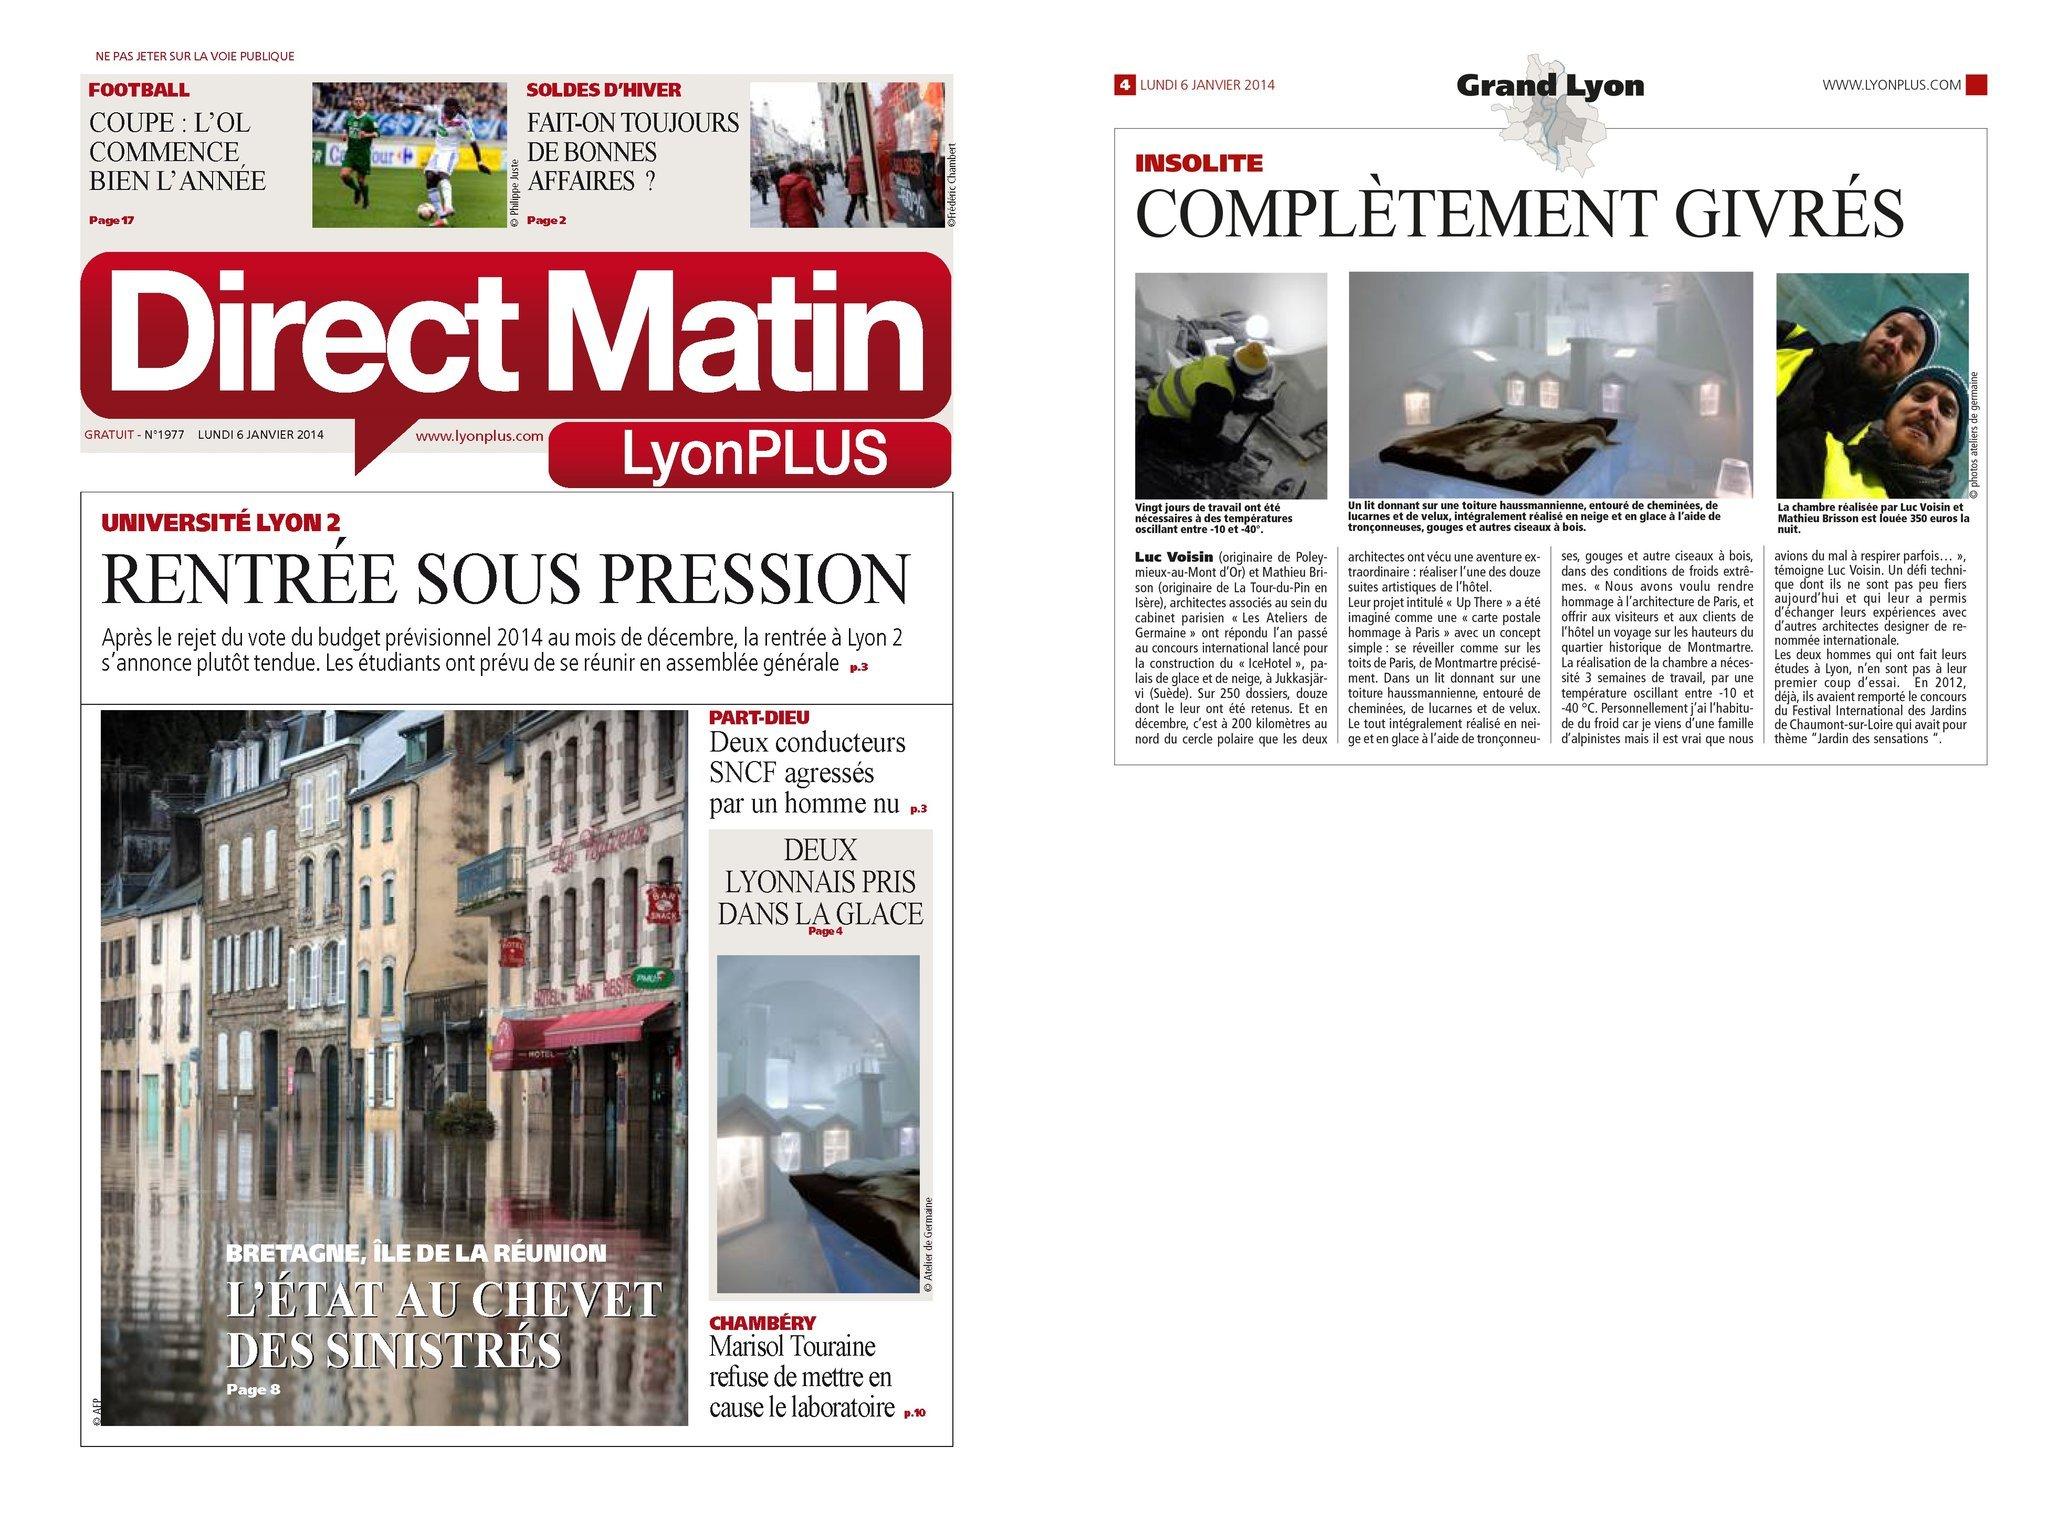 DIRECT MATIN LyonPLUS - 06/01/14